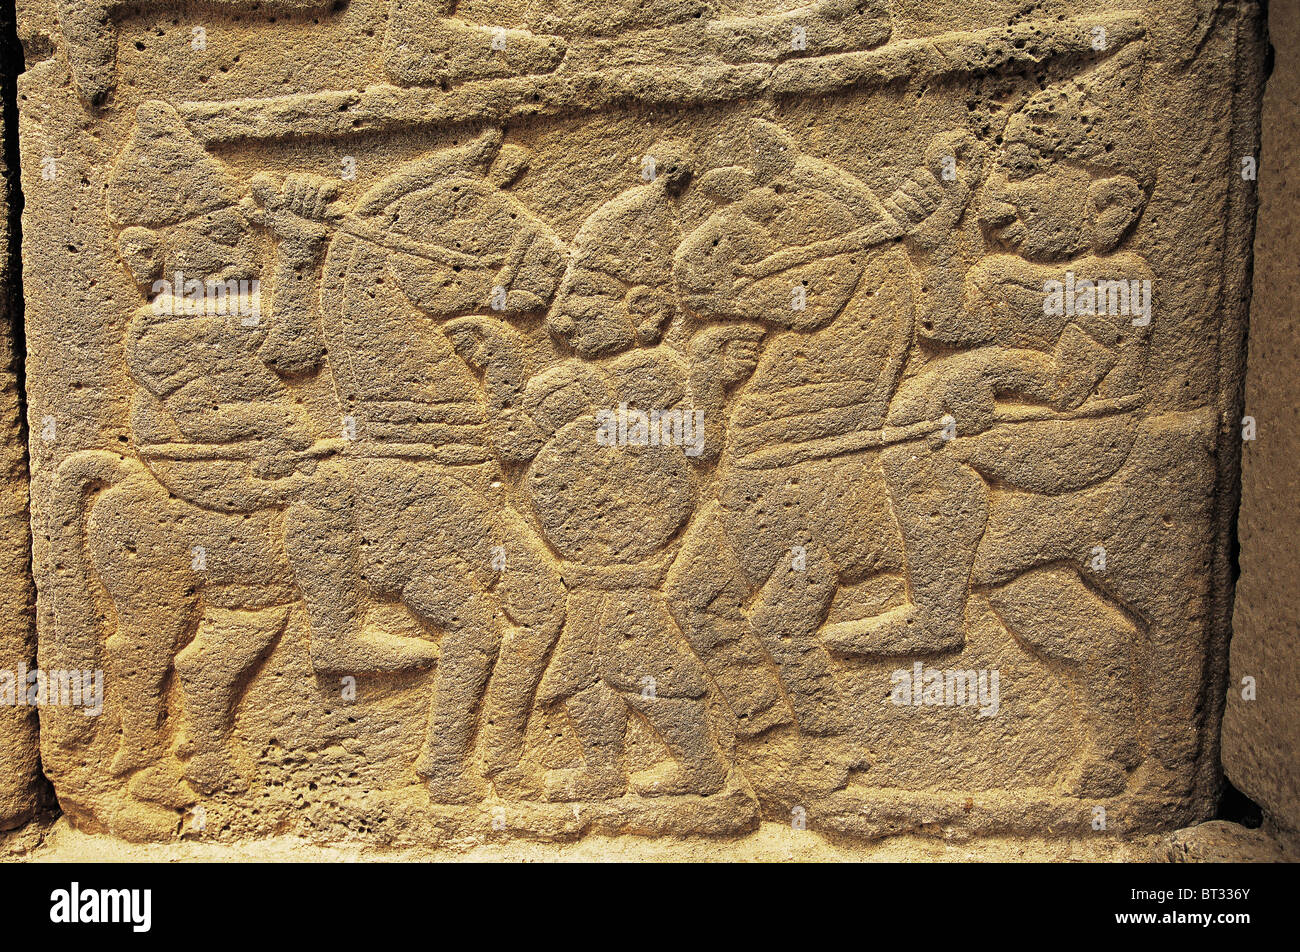 Hittite rock reliefs, Karatepe Aslantas Turkey. - Stock Image